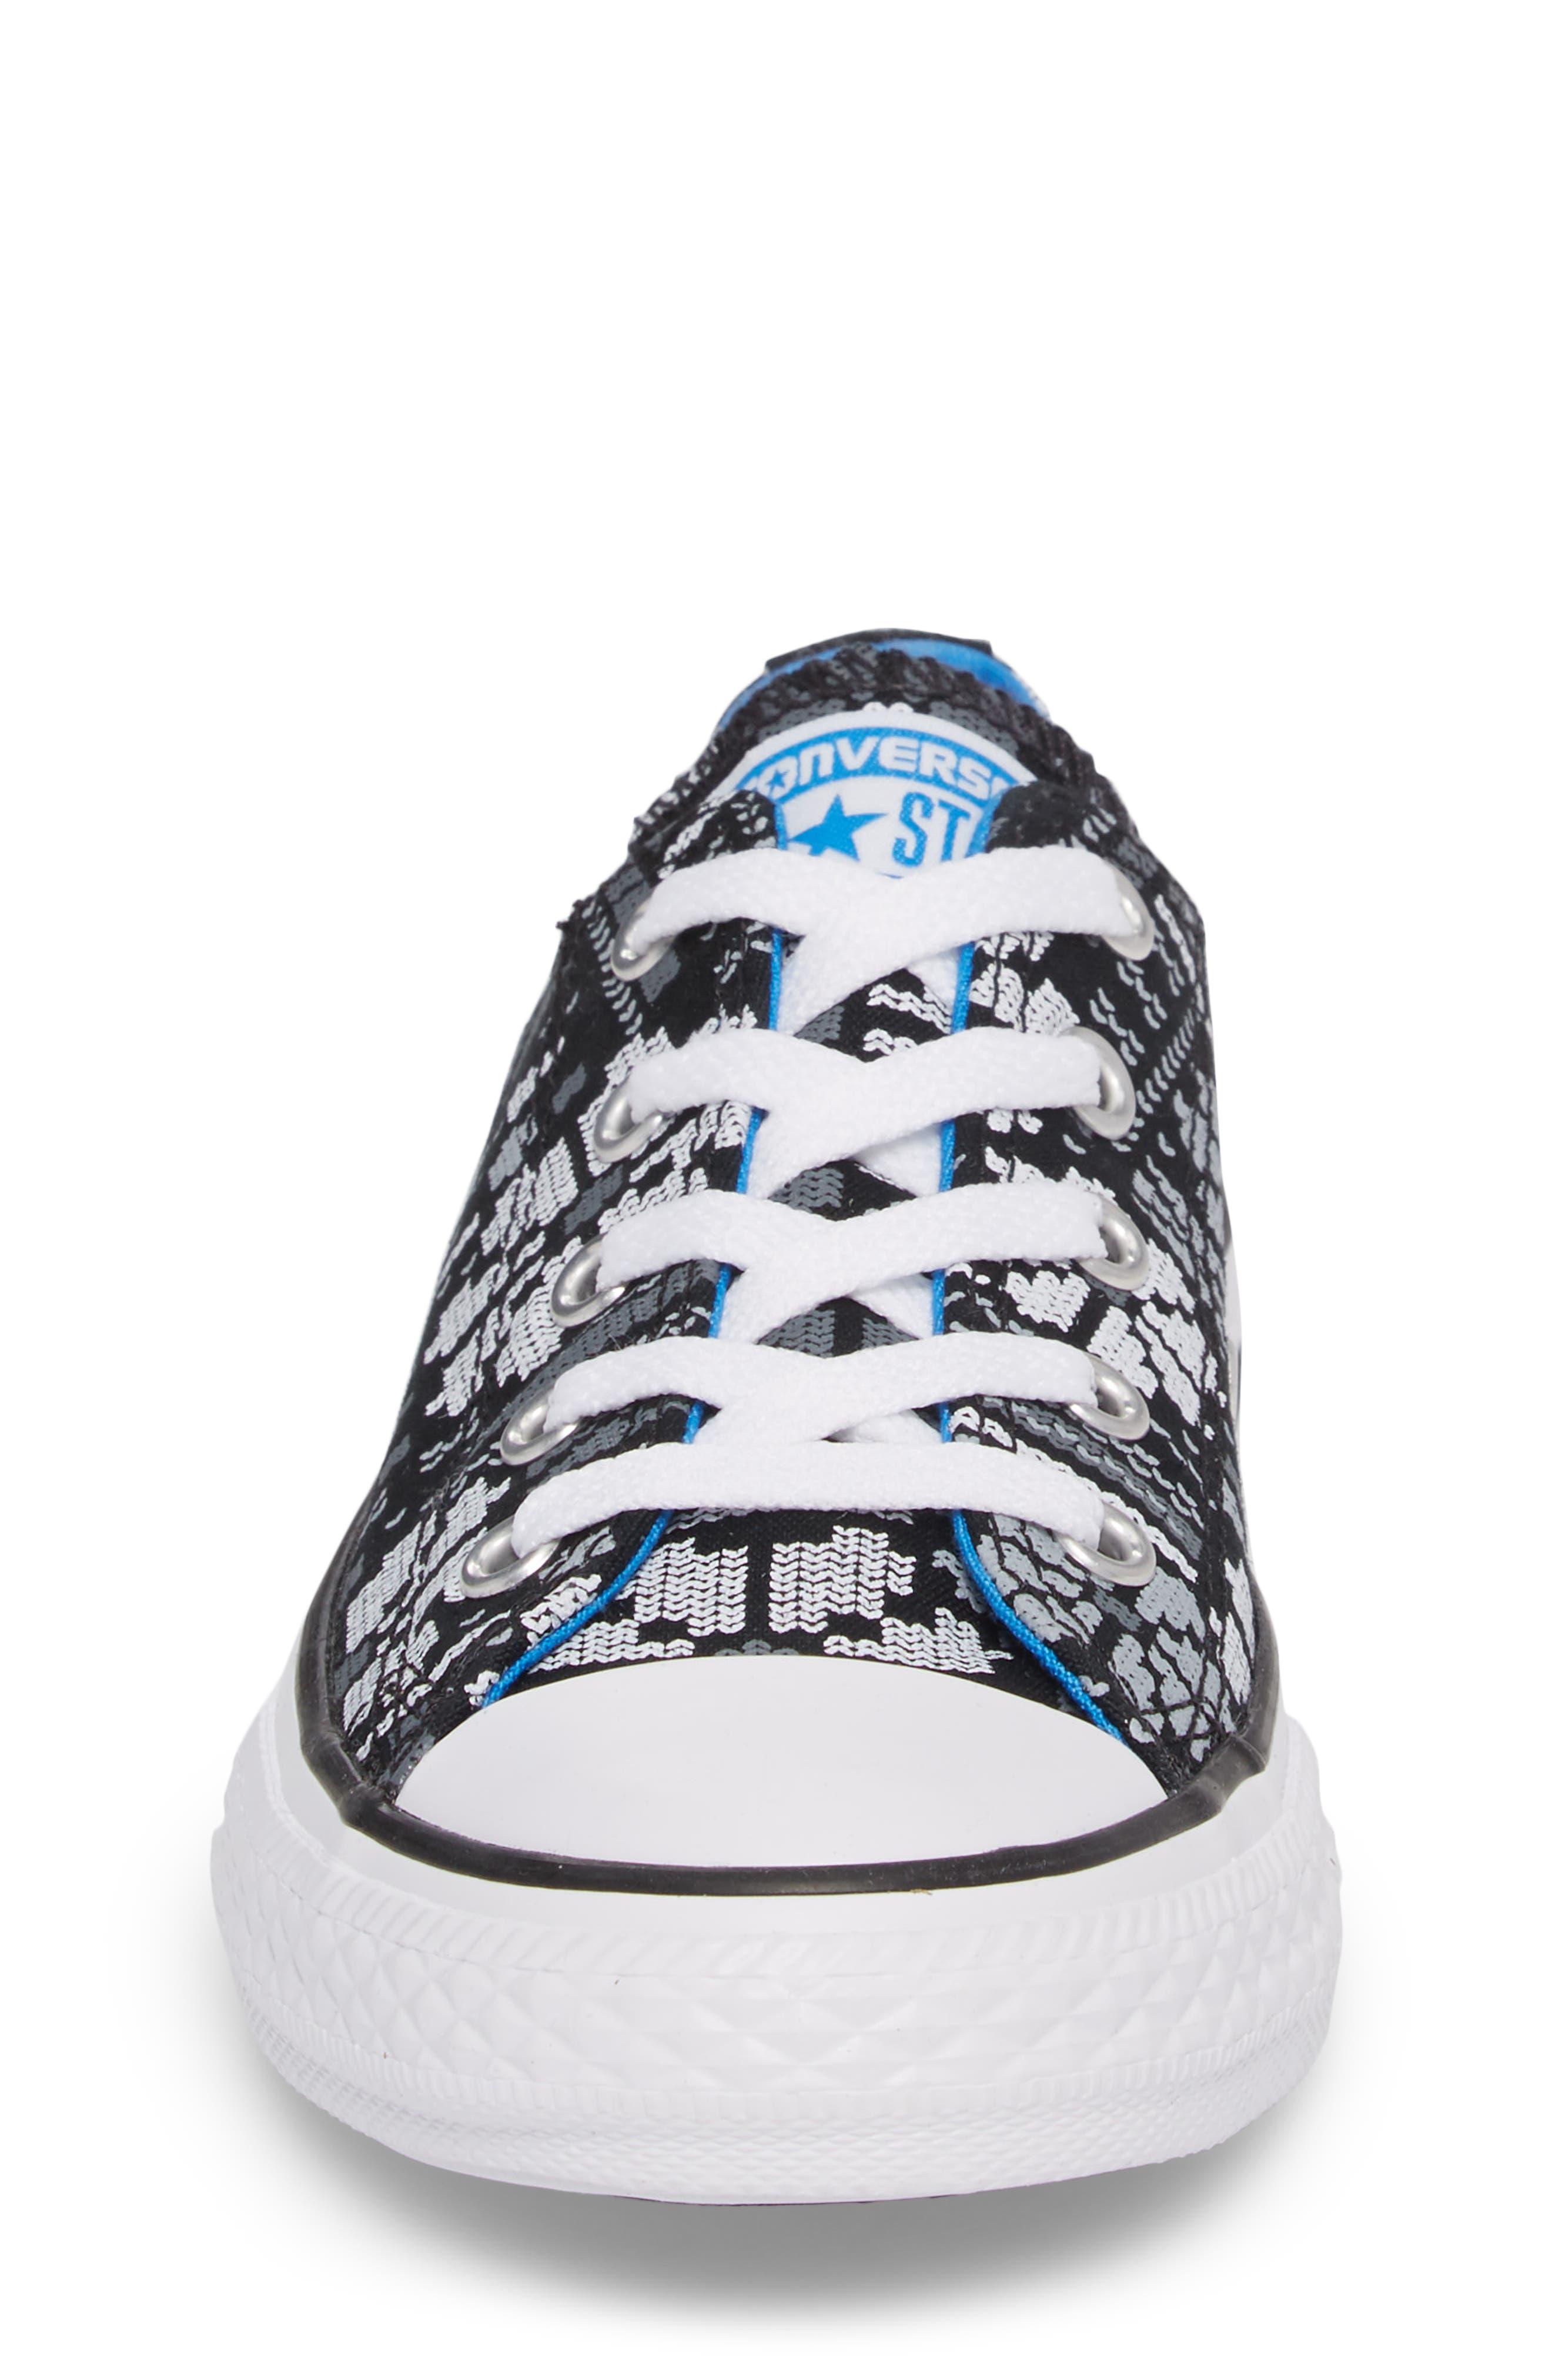 Alternate Image 4  - Converse Chuck Taylor® All Star® Winter Ox Sneaker (Toddler, Little Kid & Big Kid)